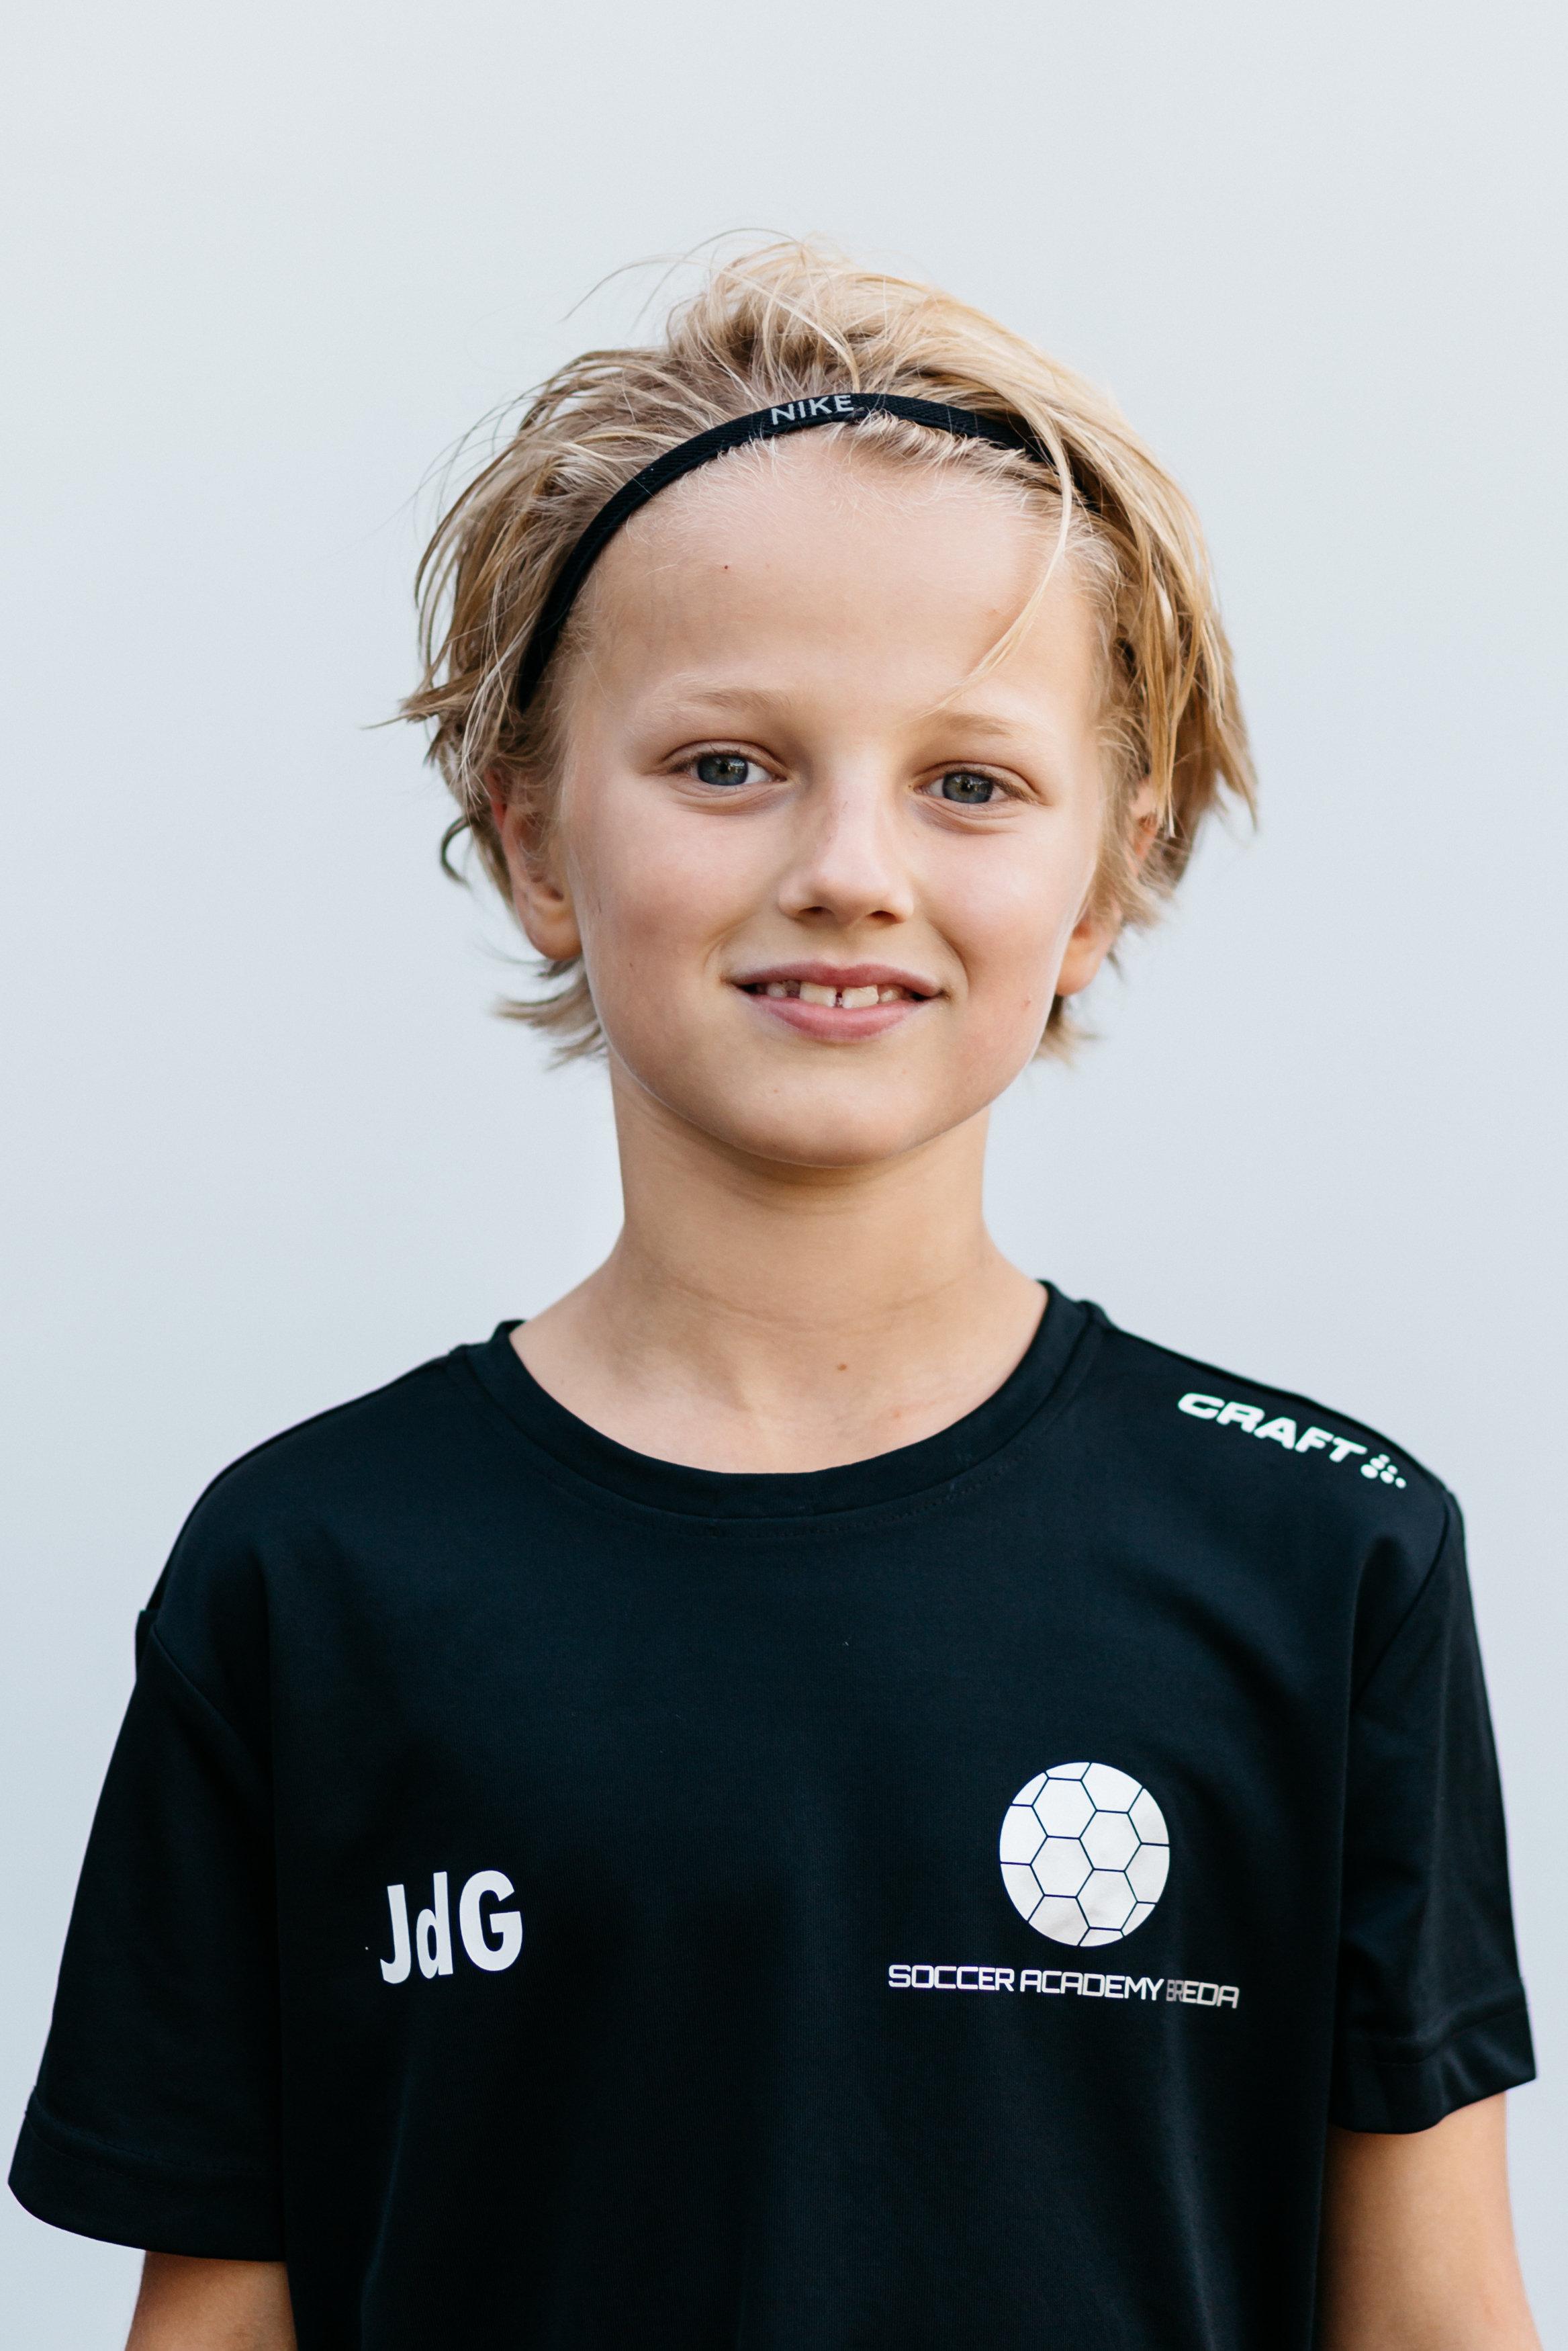 https://socceracademybreda.nl/wp-content/uploads/2020/10/jorg-de-graaf-teampagina.jpg